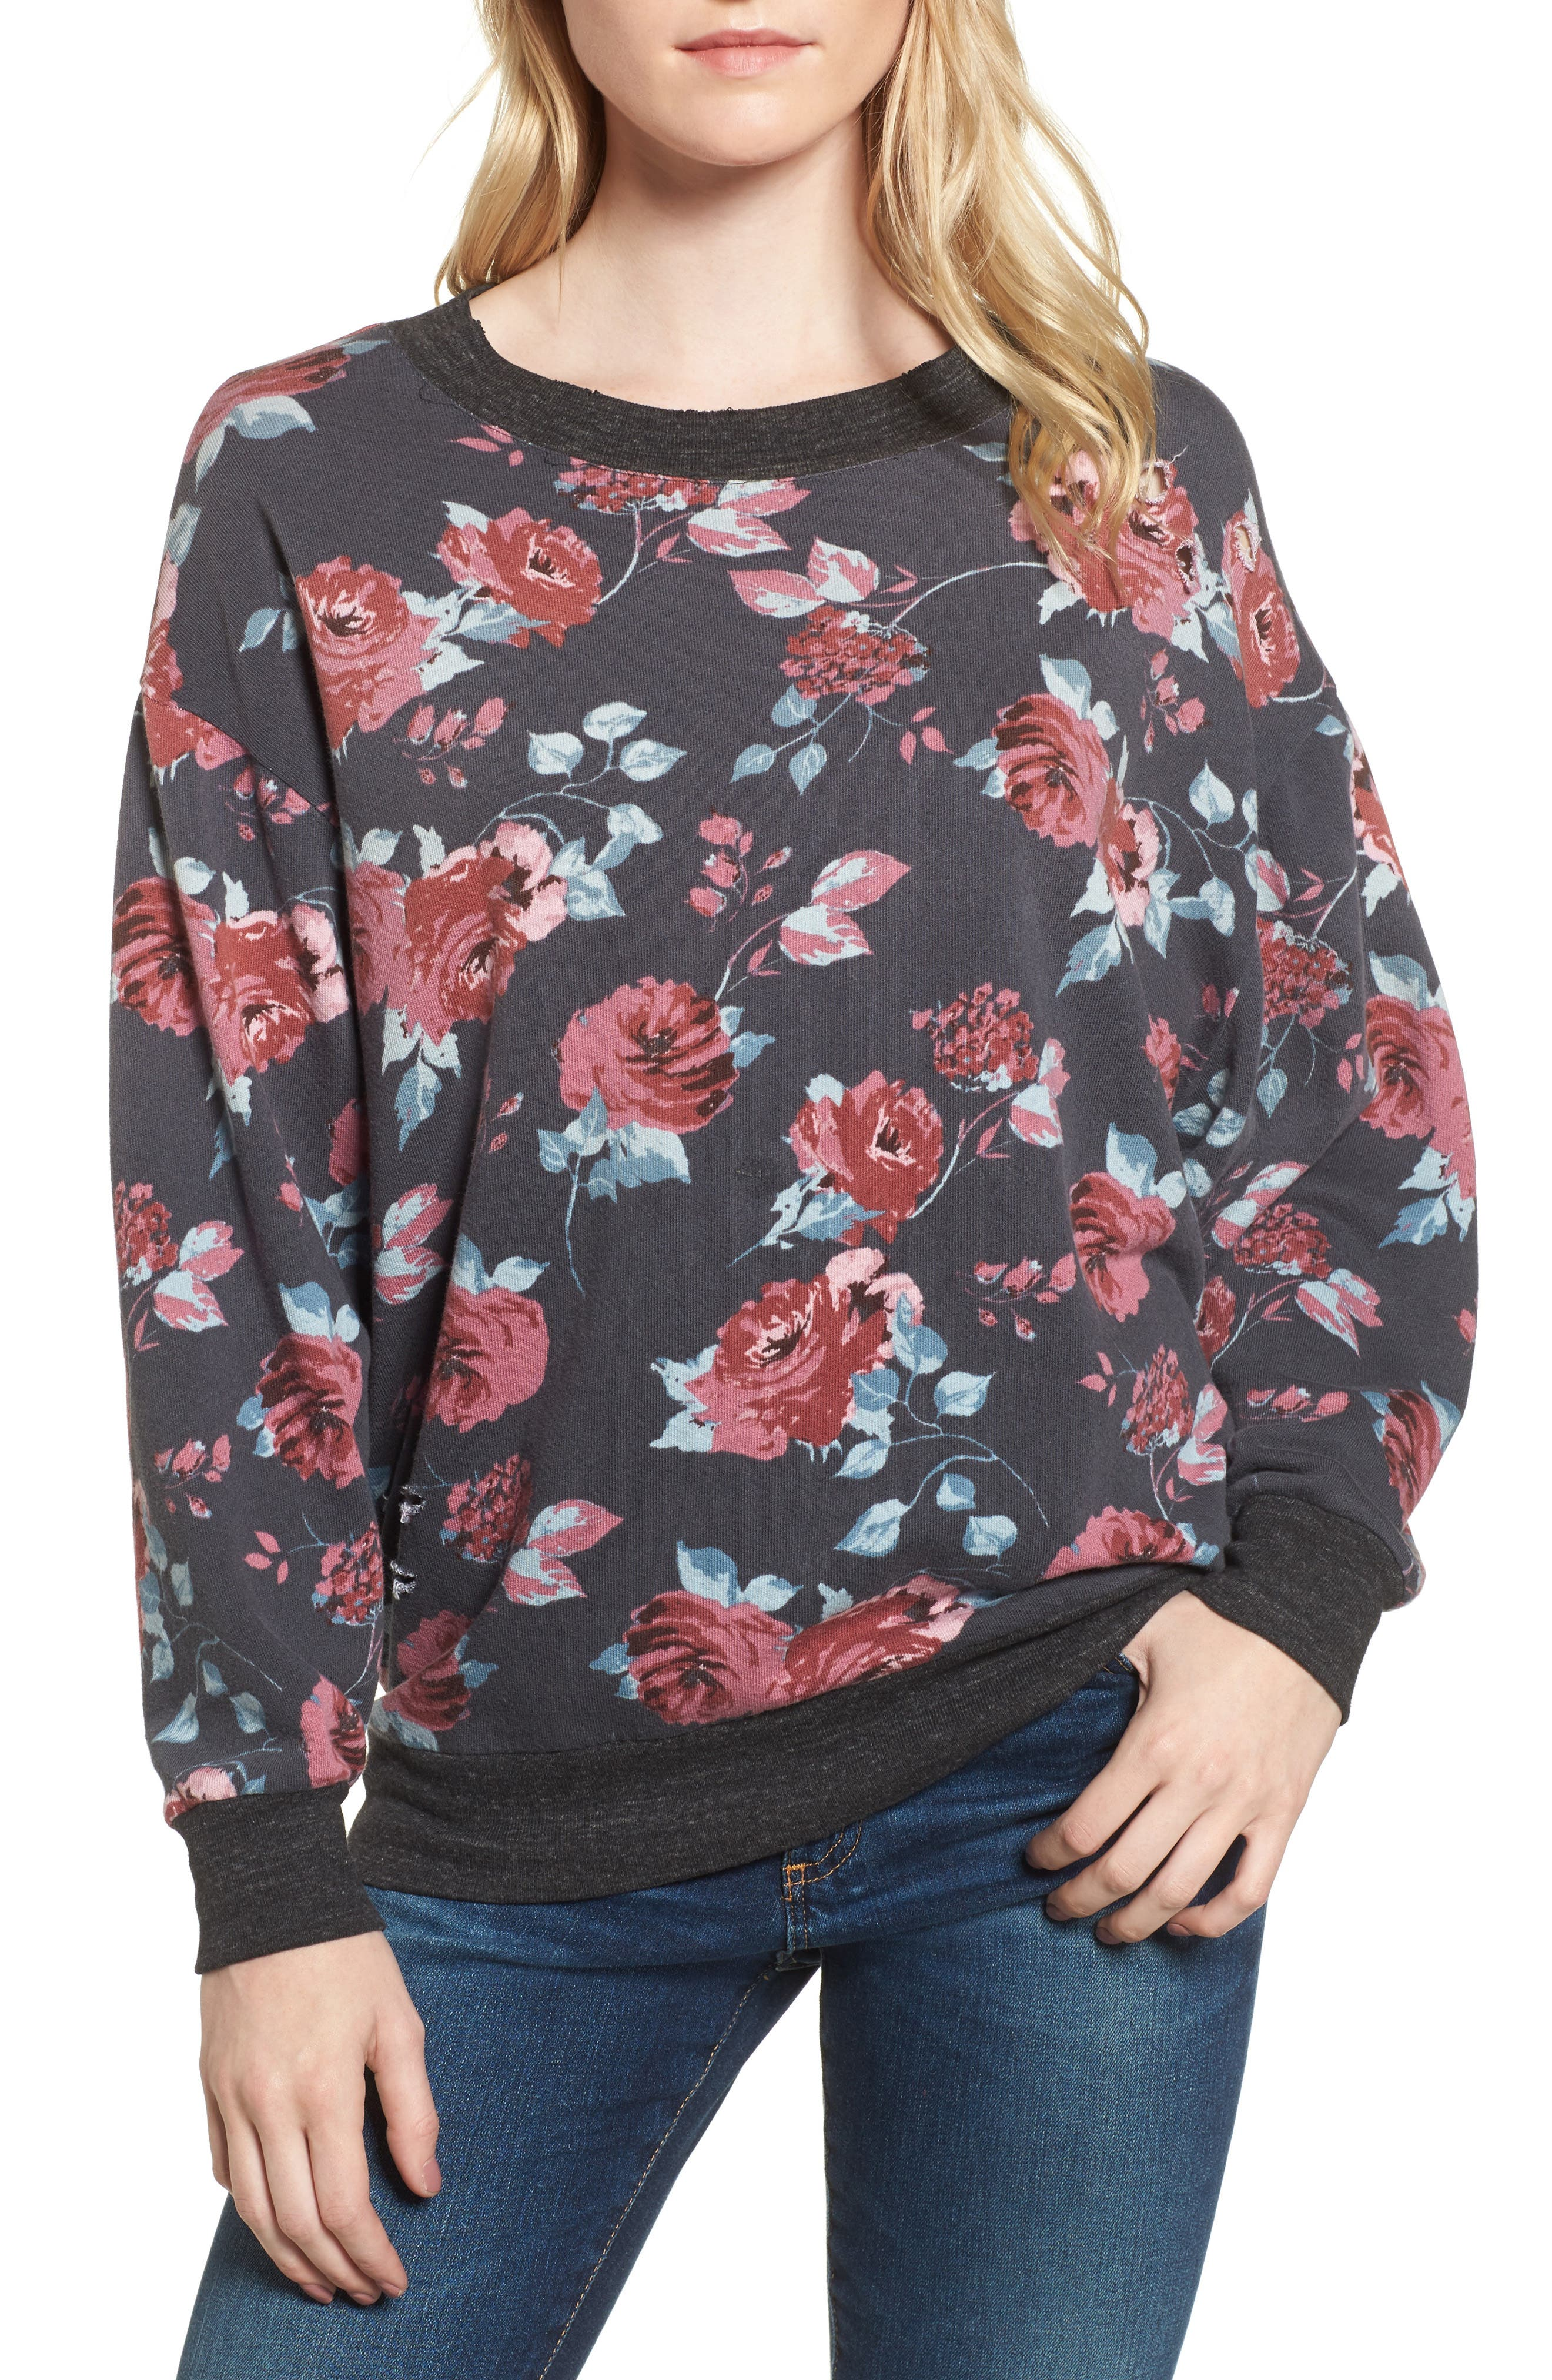 Chelsea Sweatshirt,                             Main thumbnail 1, color,                             Pitch Black